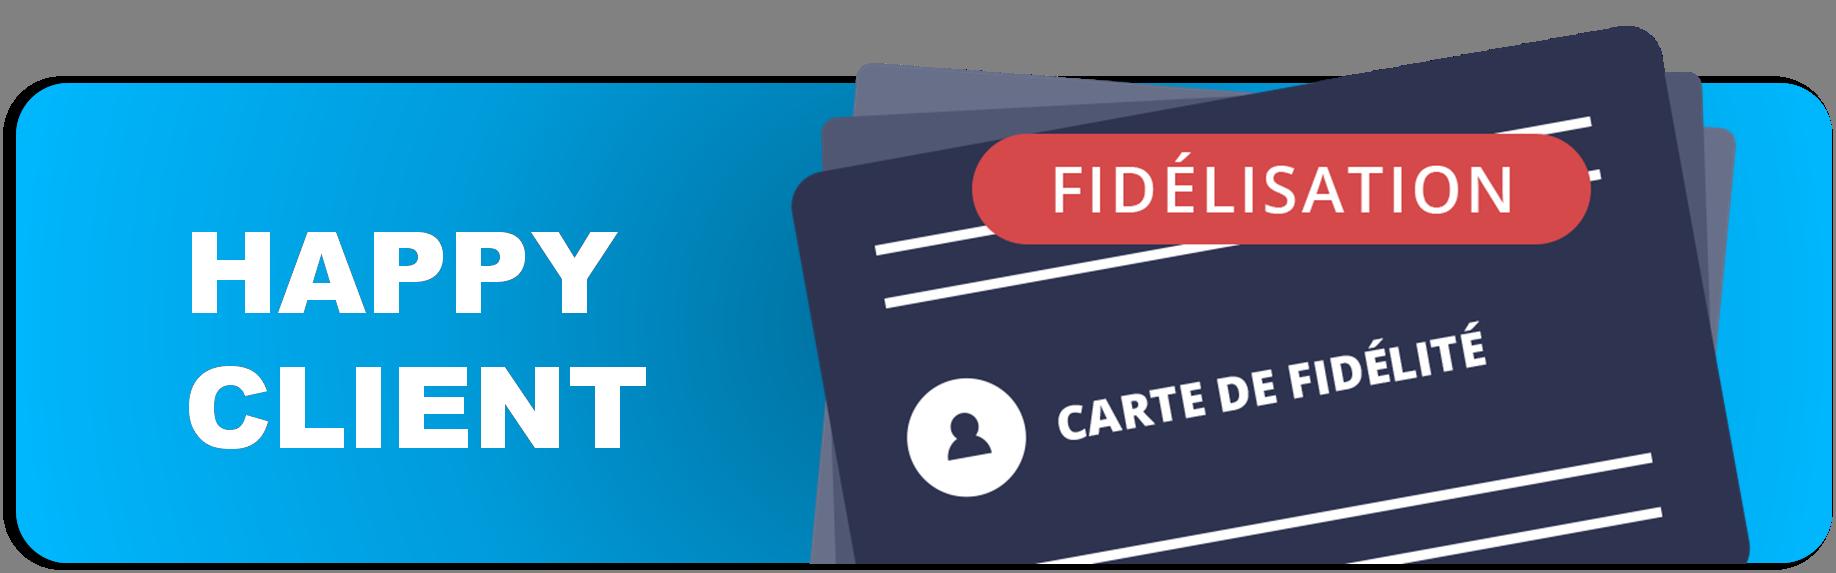 startup fidélisation client Maroc